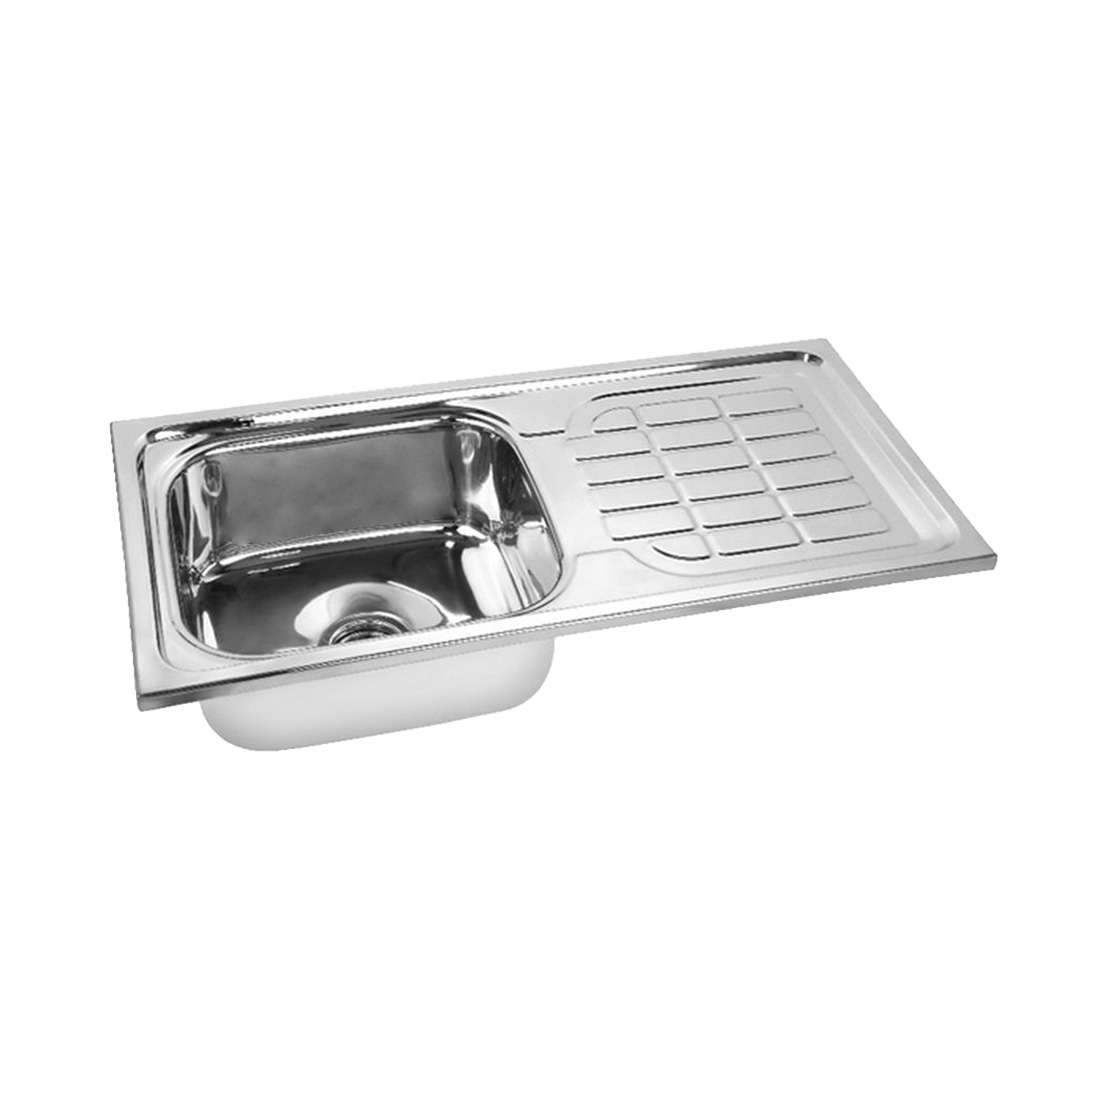 Prayag 939-DM Glossy Single Bowl With Drain Board